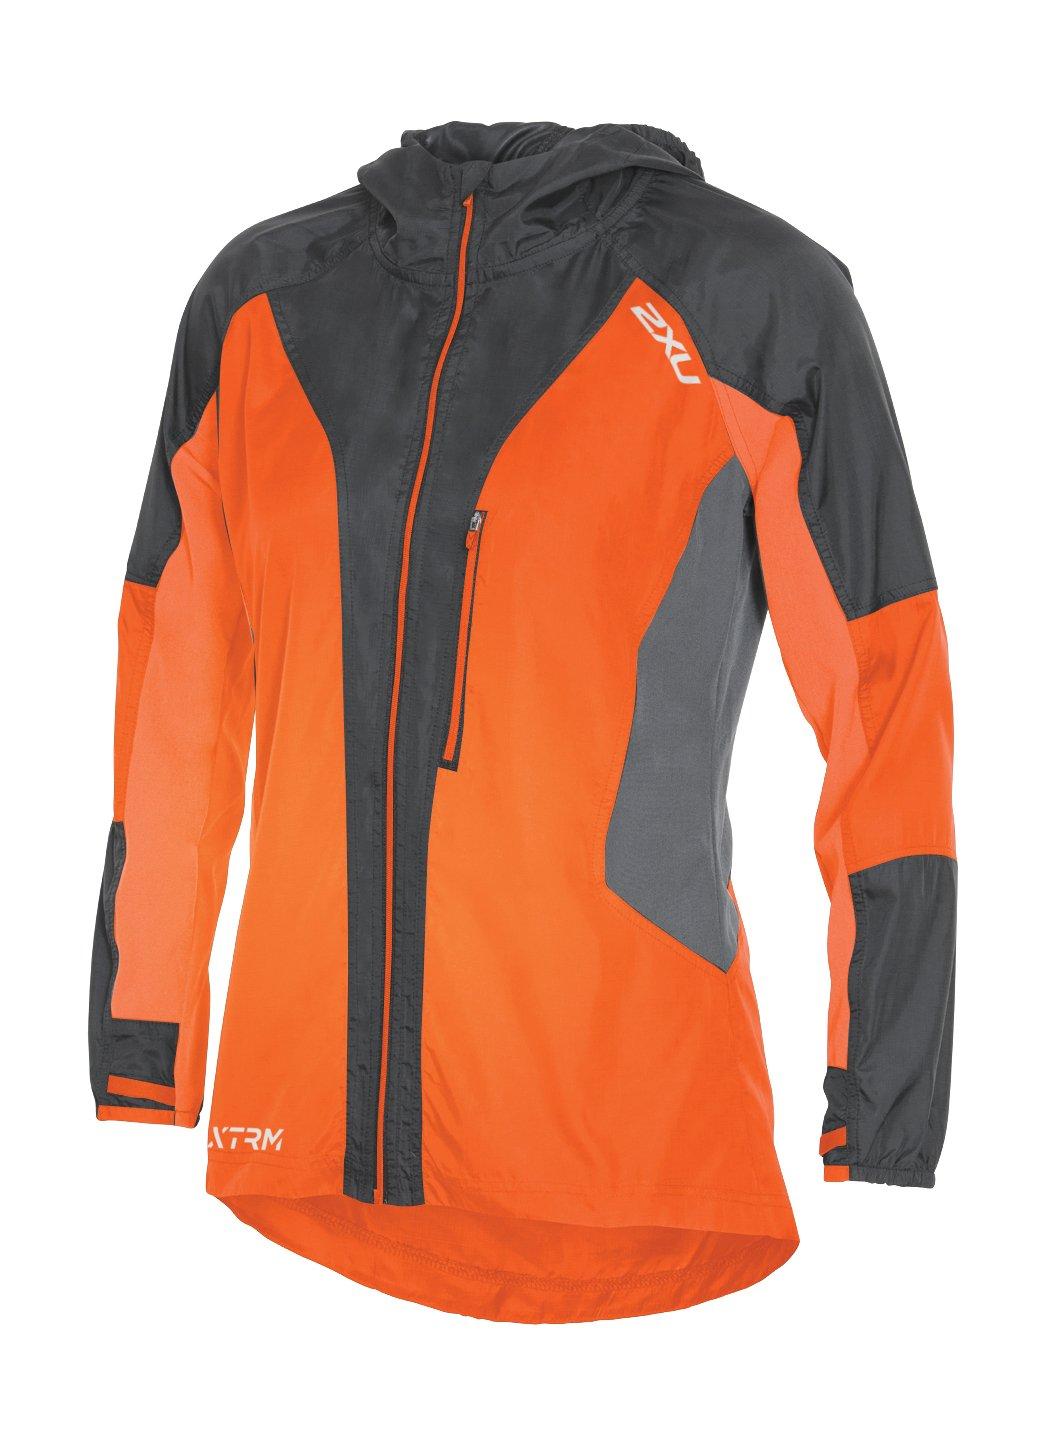 2 x UレディースXTRM Raceジャケット S Sunburst Orange/Ink B01BISD0T0